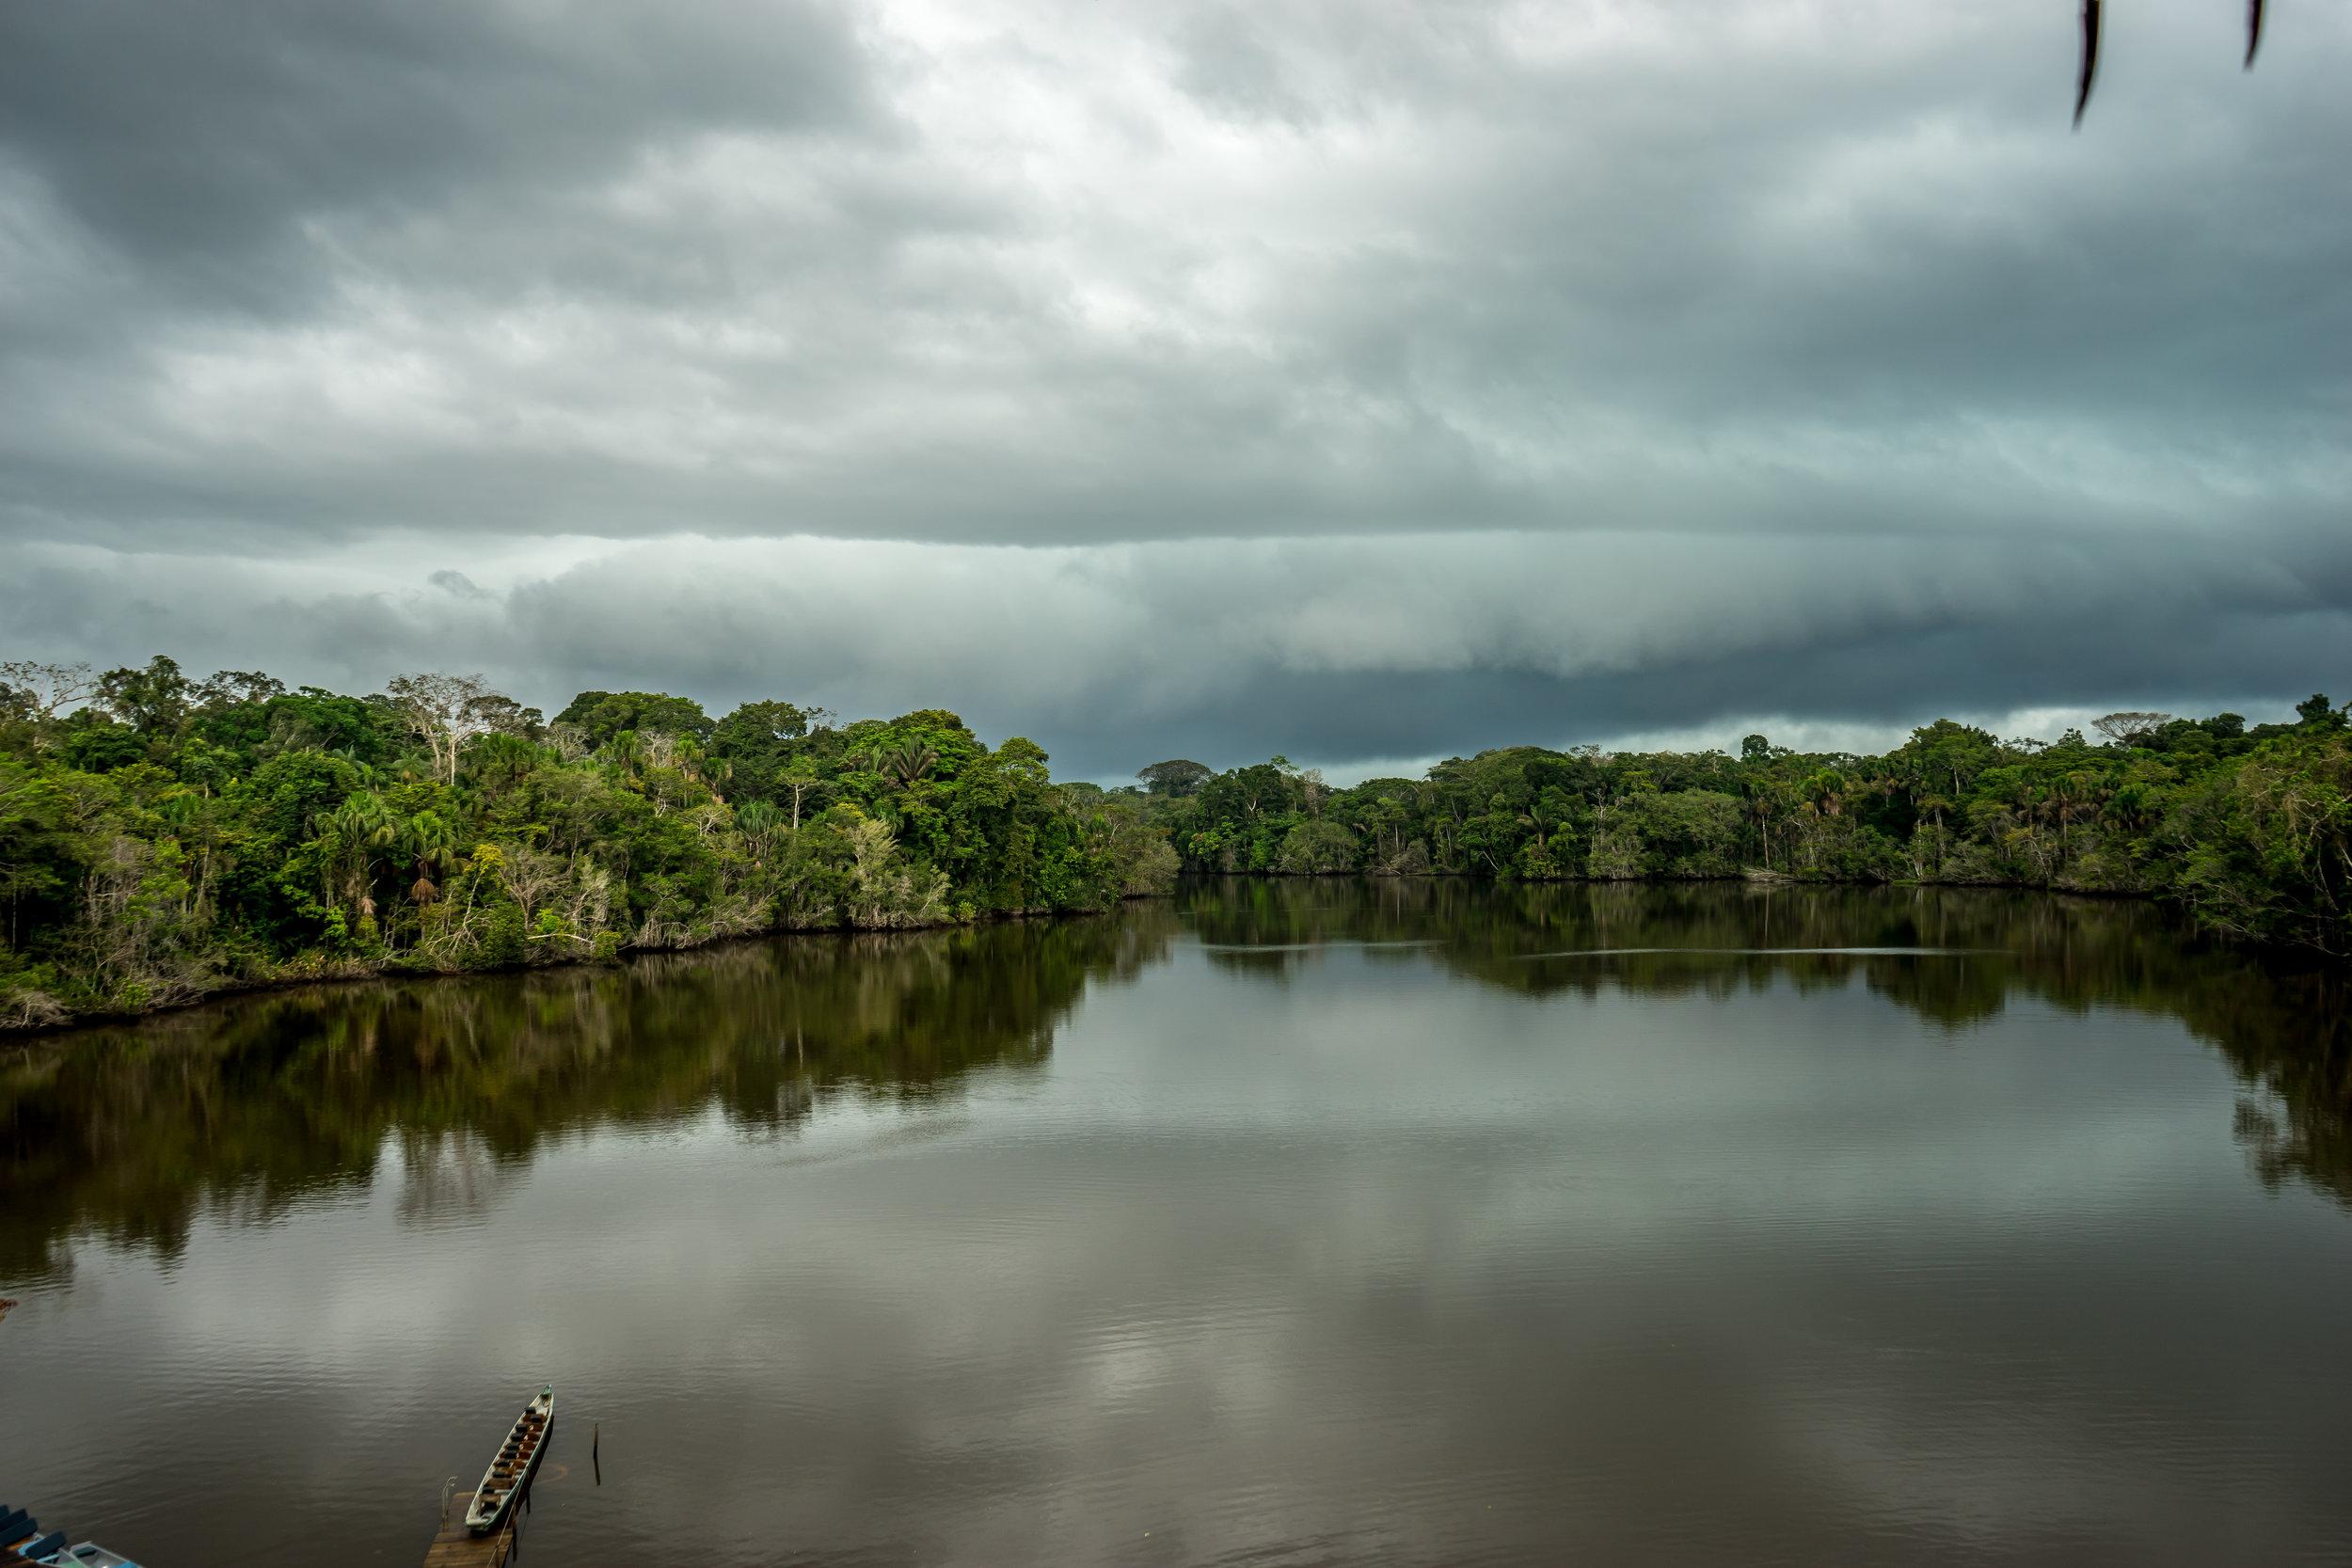 Approaching Amazon Rain Storm